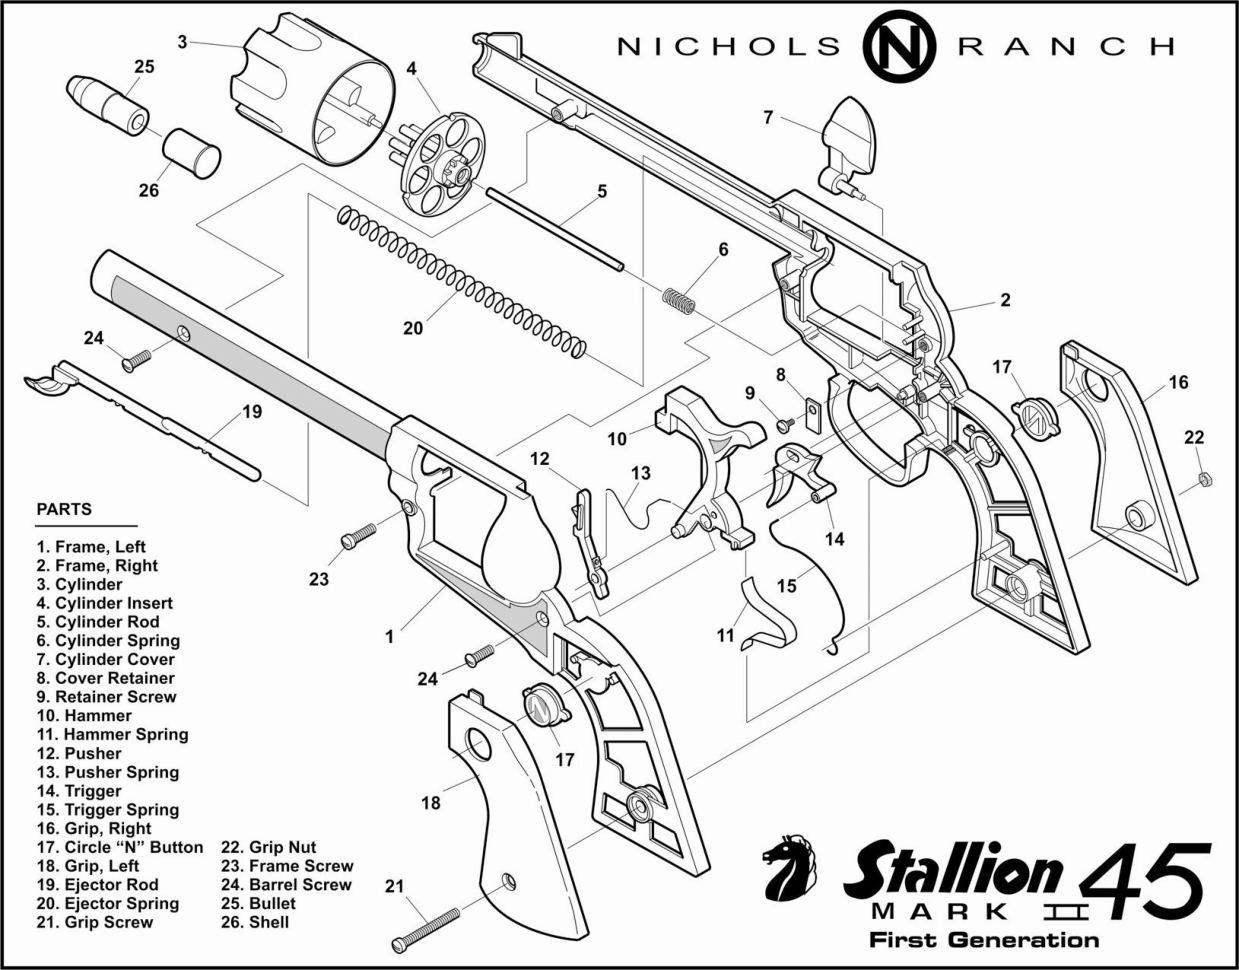 schematics for rail and coil guns